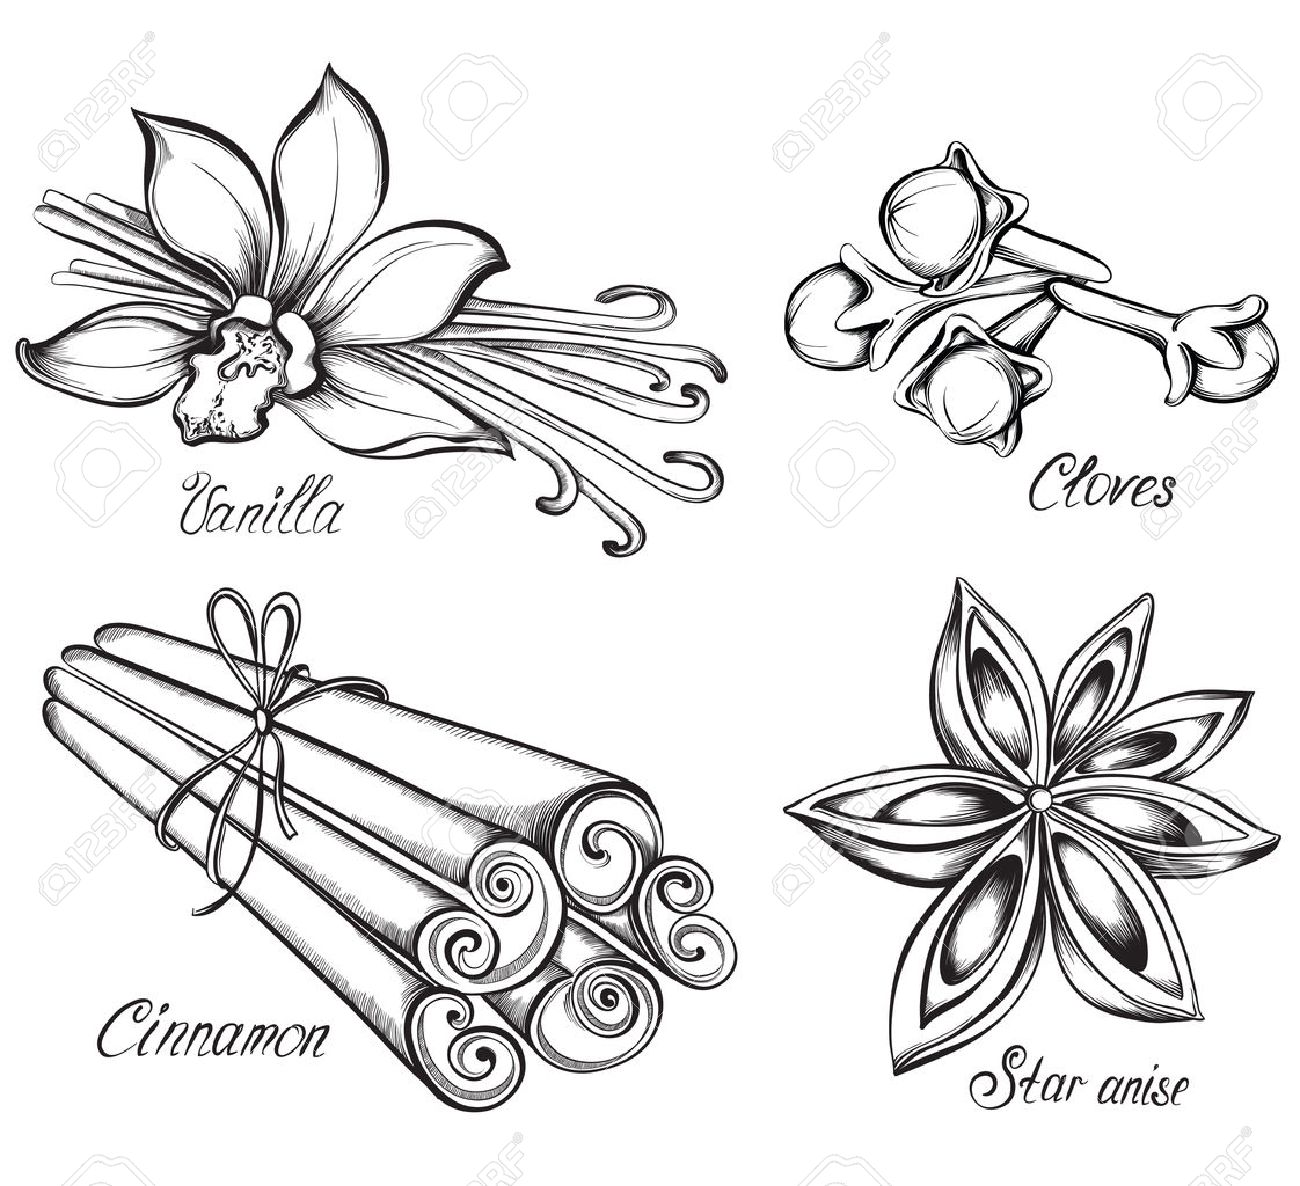 Set of kitchen spices. Vanilla, cinnamon, cloves, star anise. Hand drawn vector illustration. - 53584896